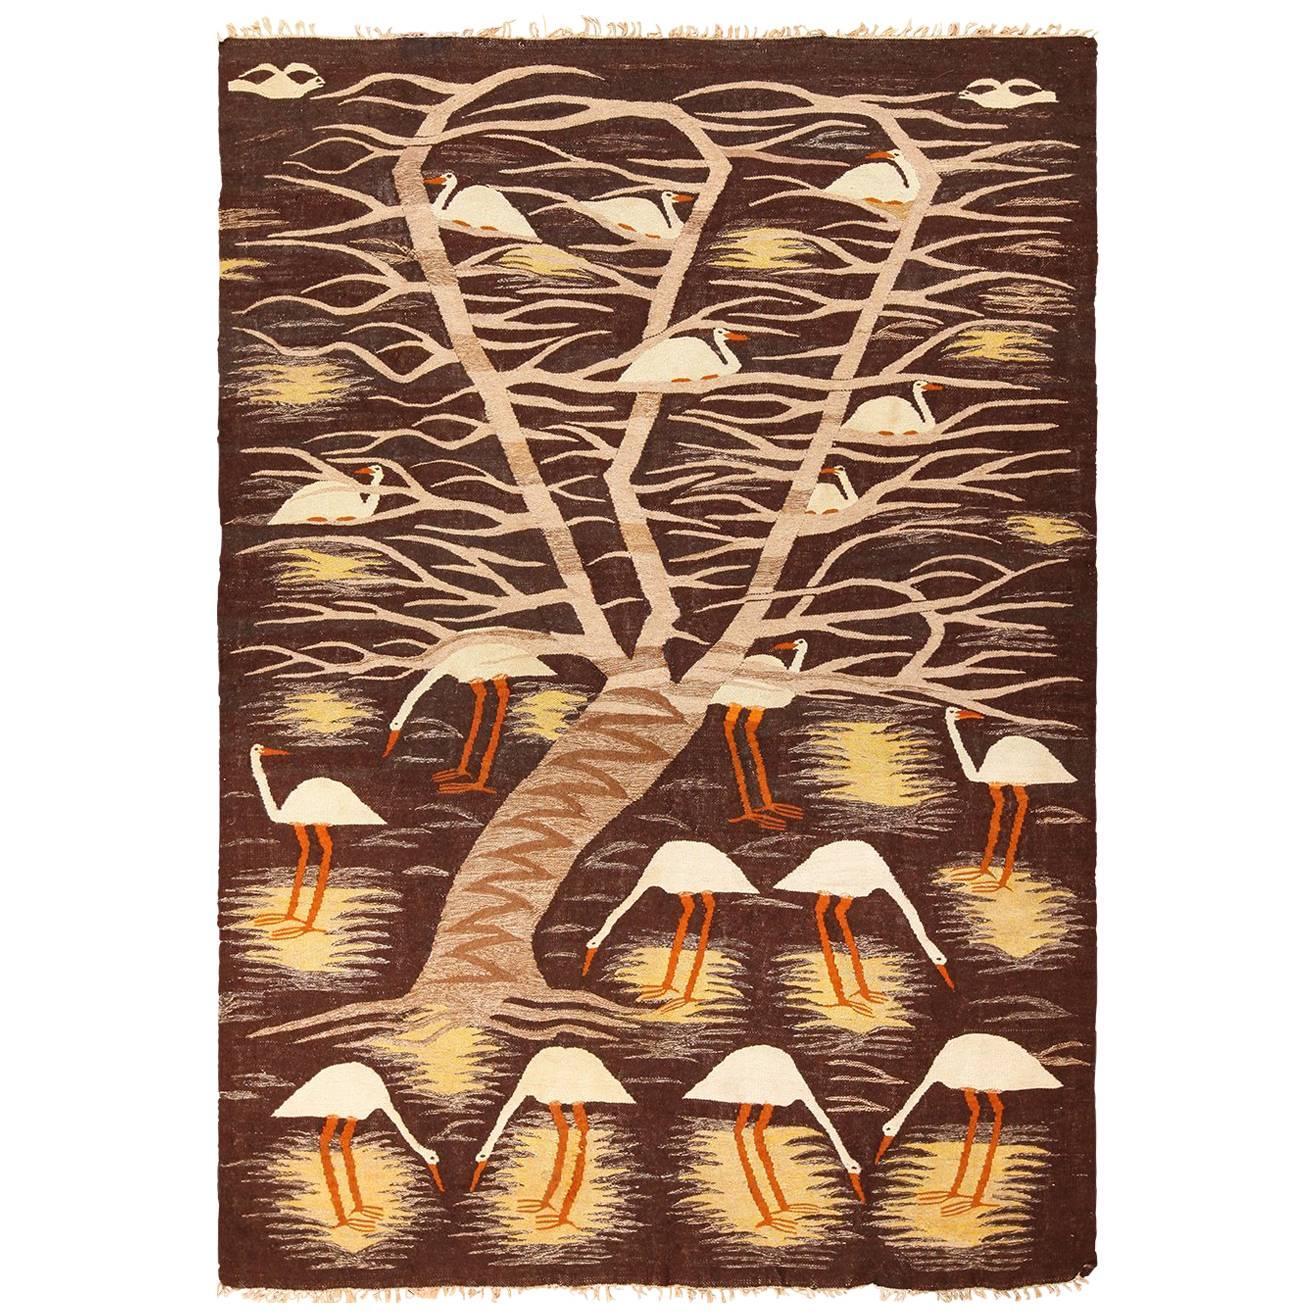 Naturalist Scene Vintage Scandinavian Kilim Rug. Size: 5 ft 9 in x 8 ft